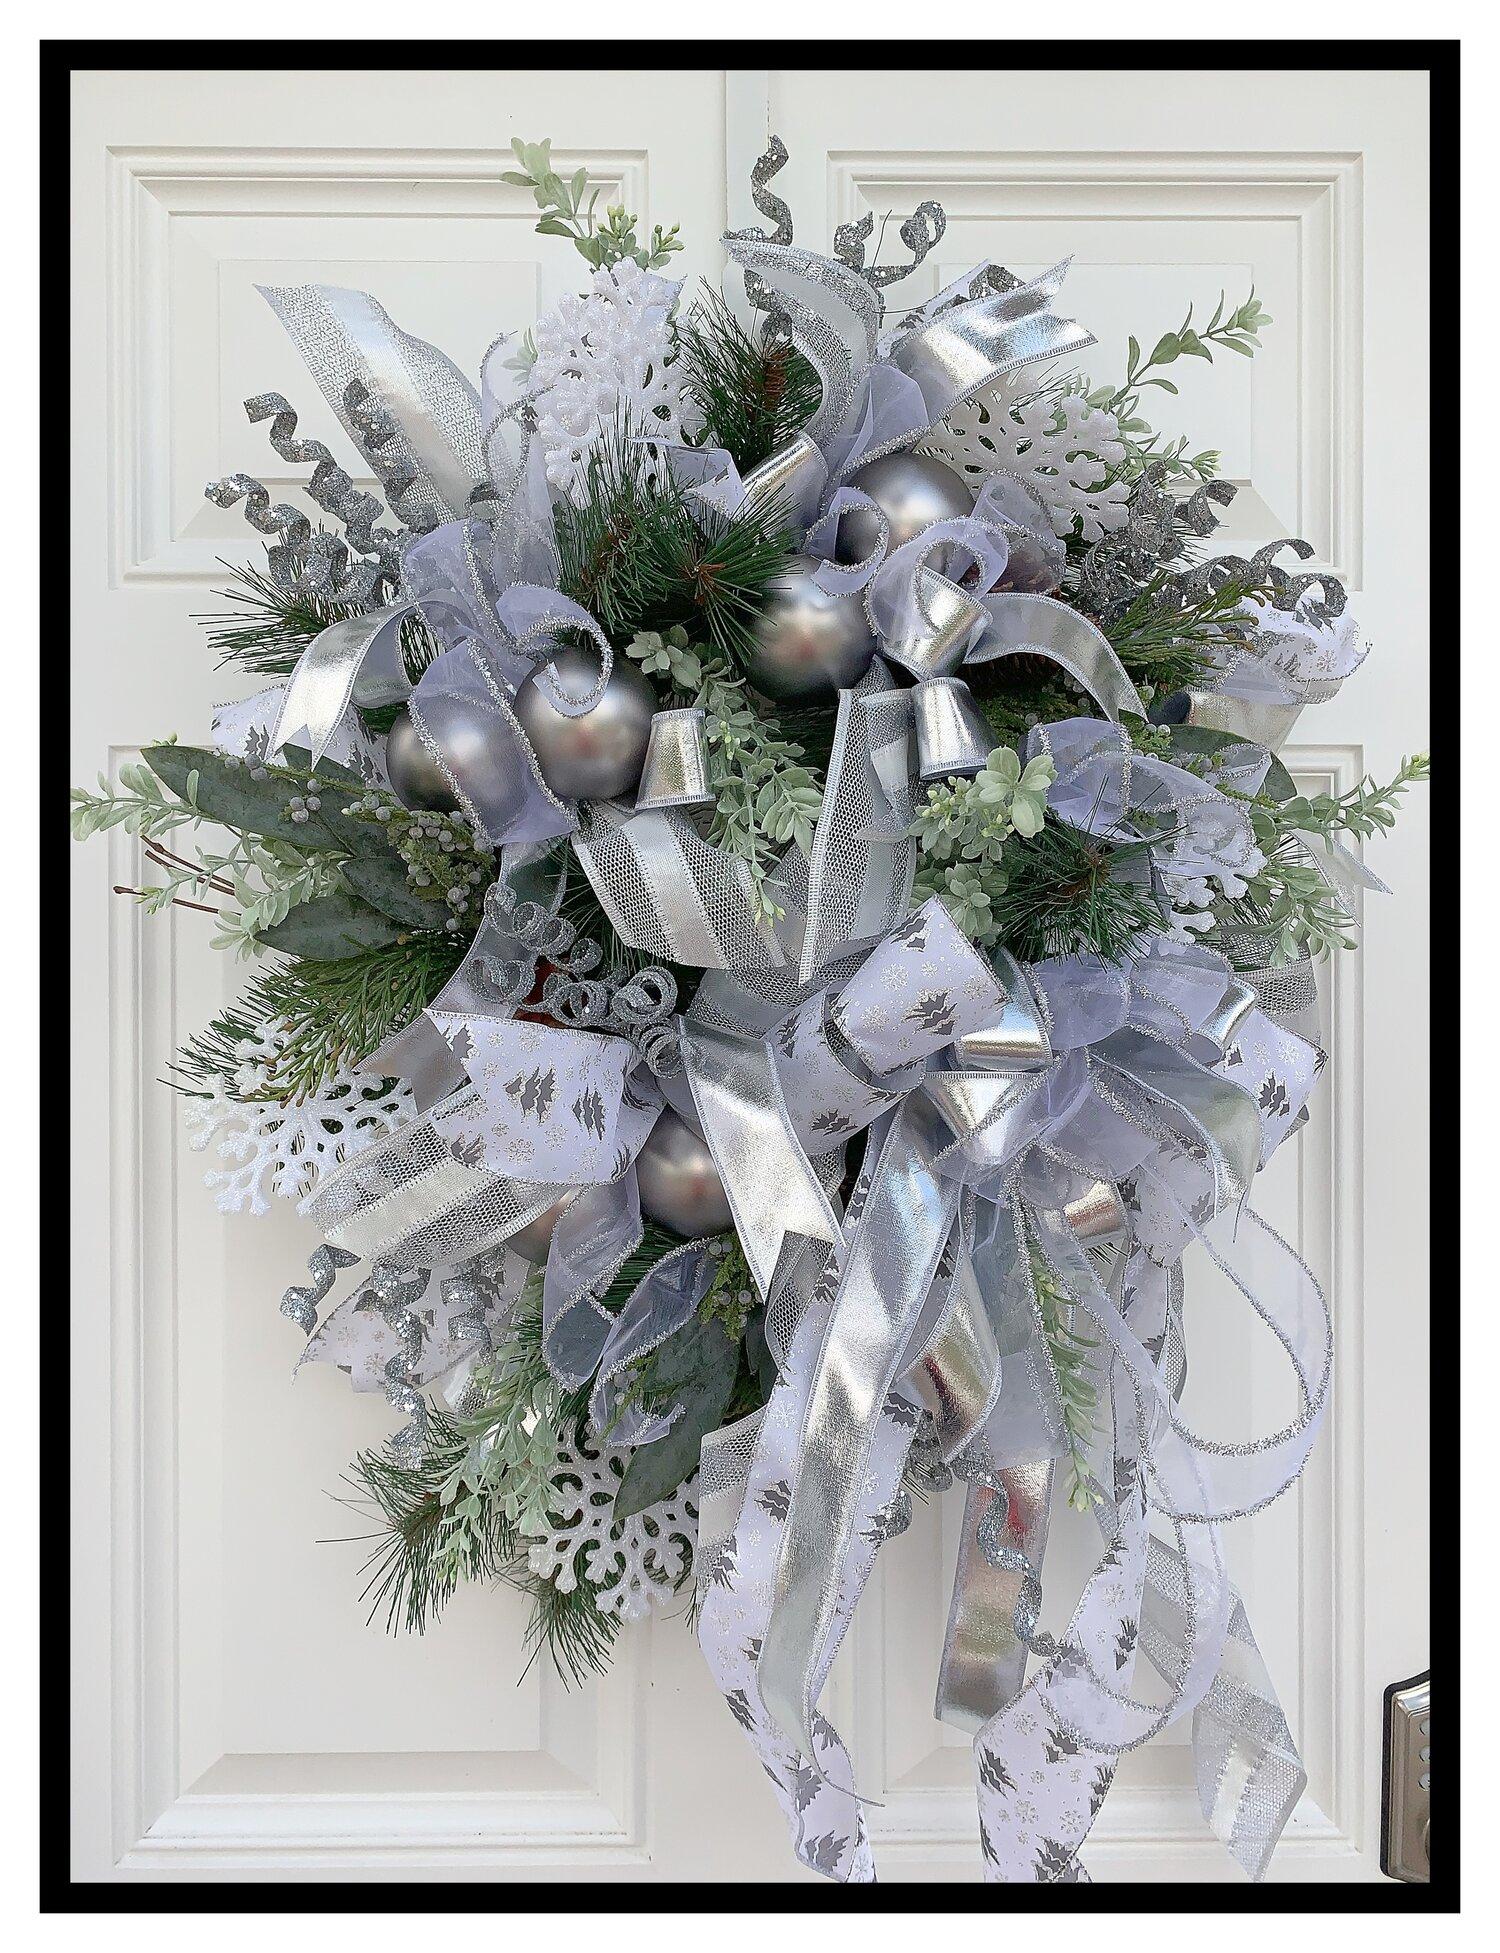 Silver Christmas Wreath.Silver Christmas Wreath Front Door Wreath Modern Christmas Decor Sugar Creek Home Decor